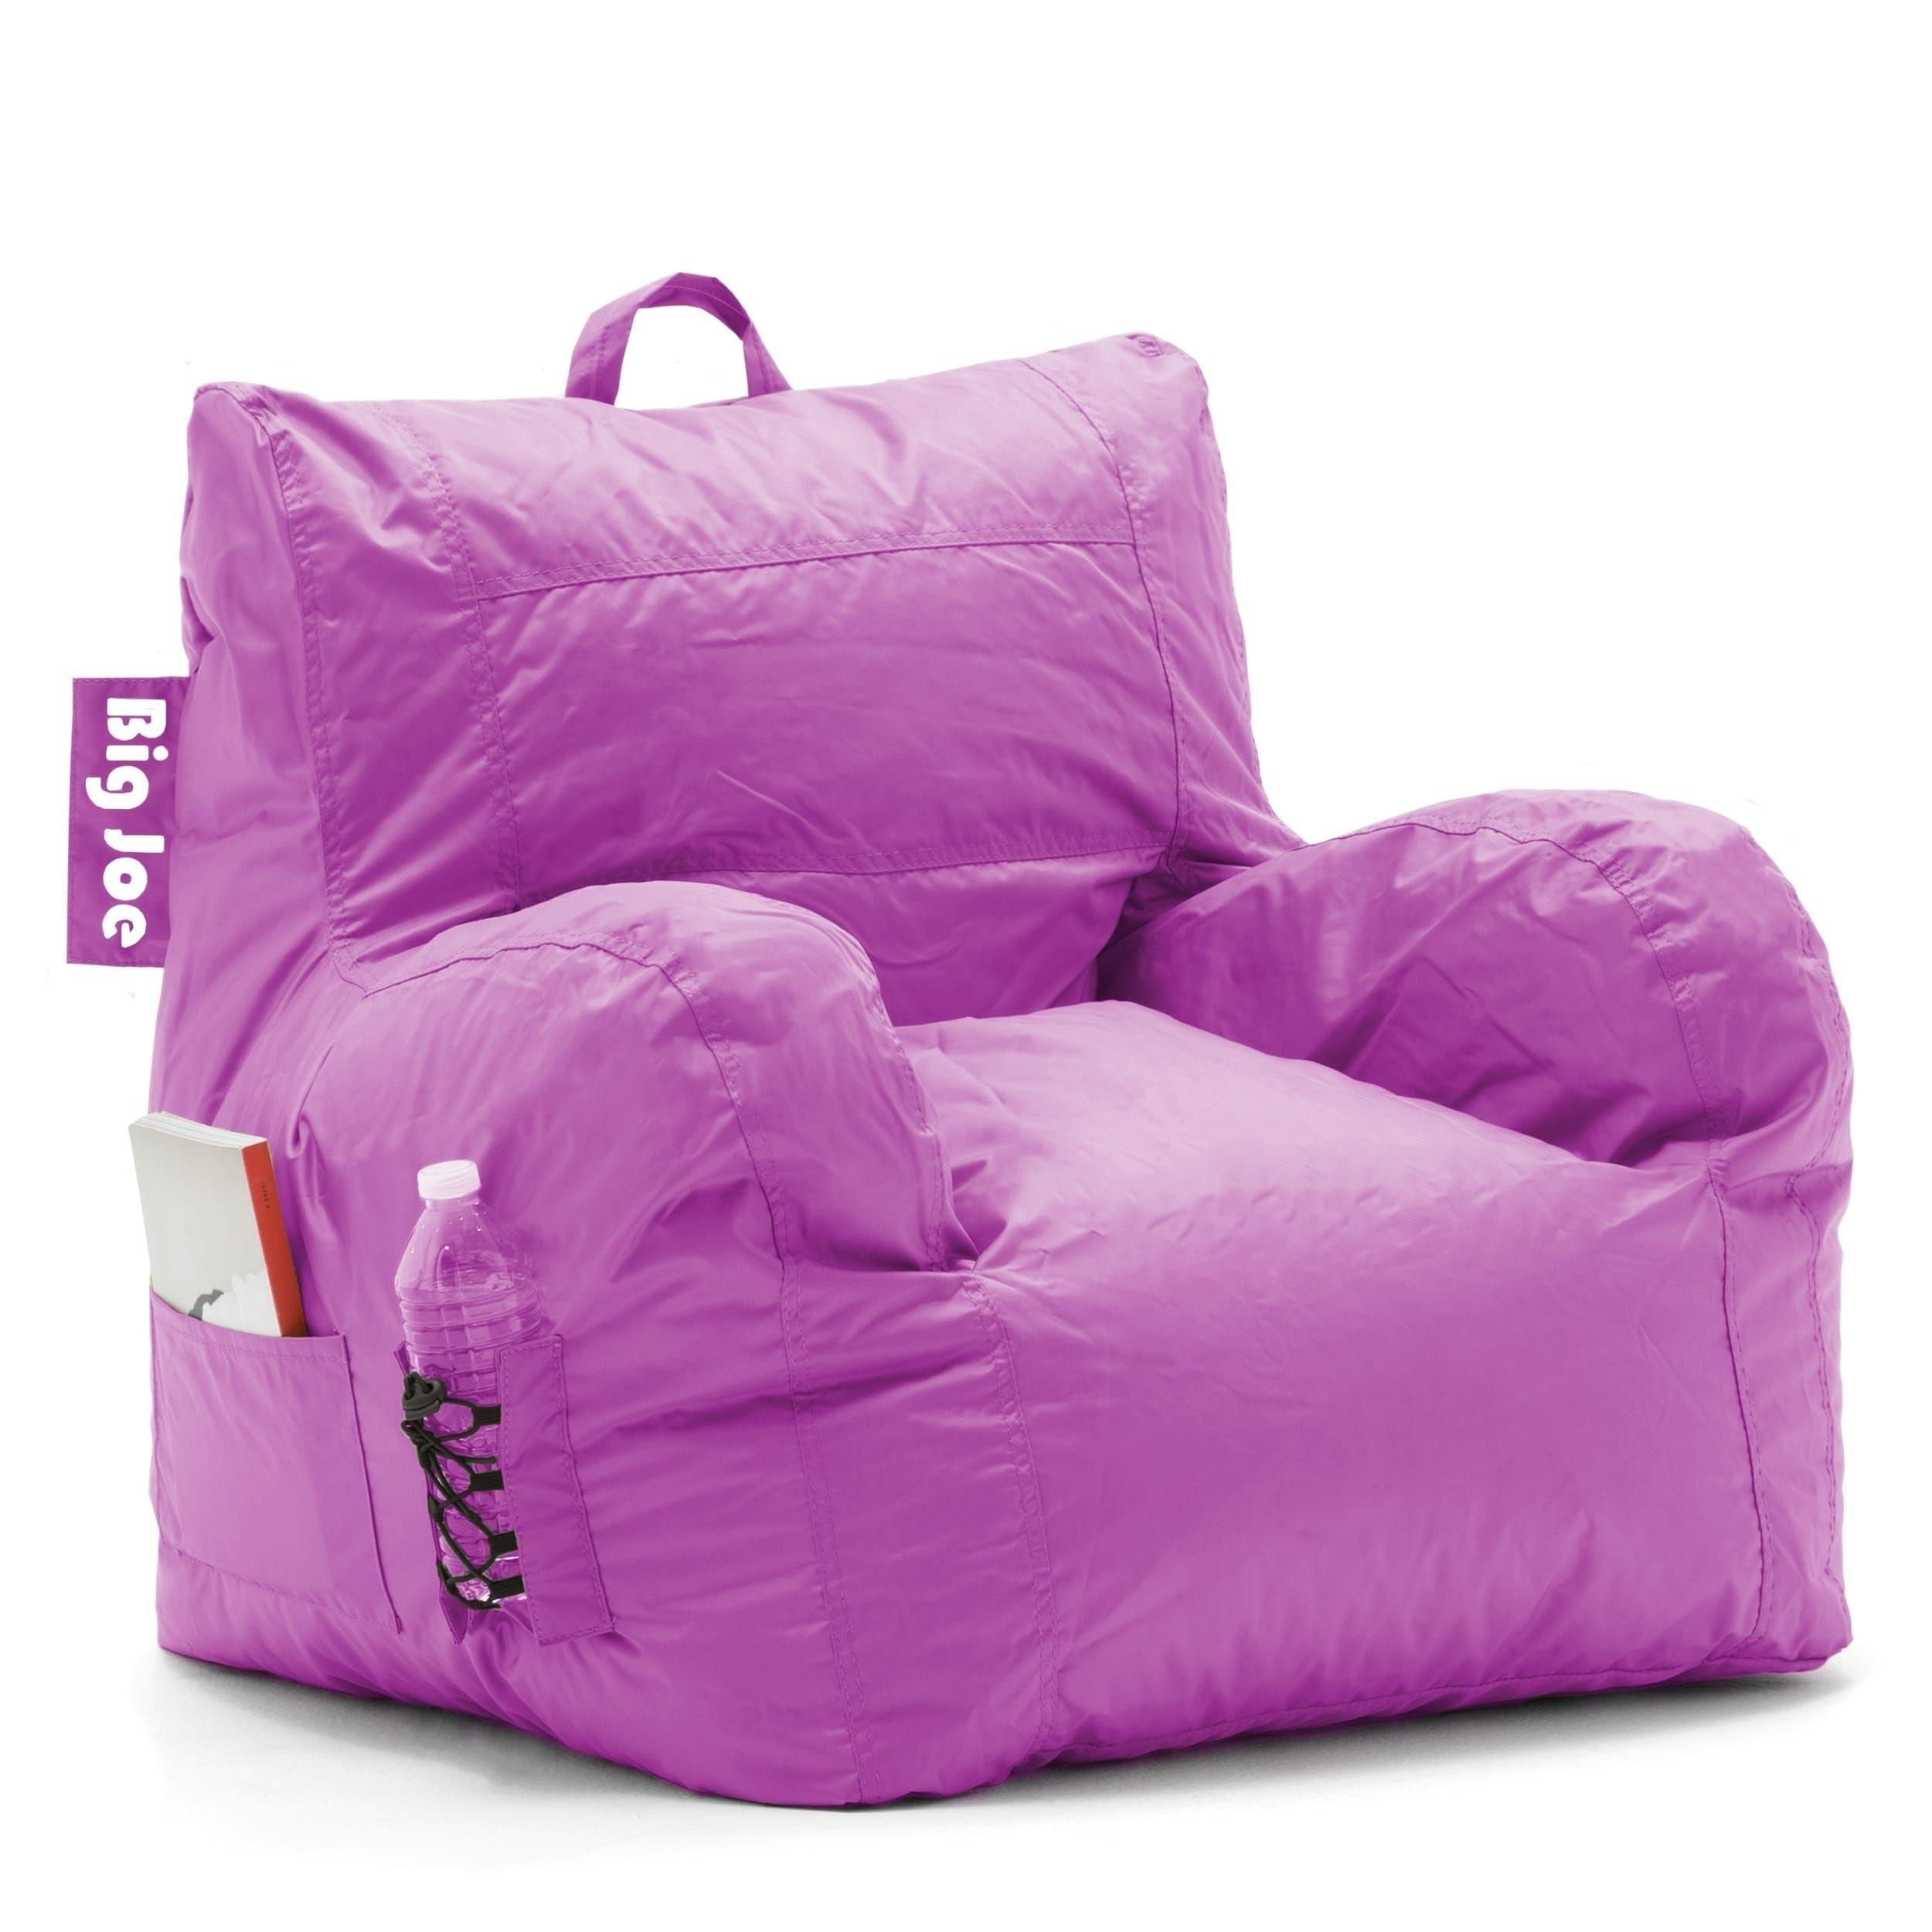 Online Shopping Bedding Furniture Electronics Jewelry Clothing More Bean Bag Chair Bean Bag Lounger Bean Bag Gaming Chair